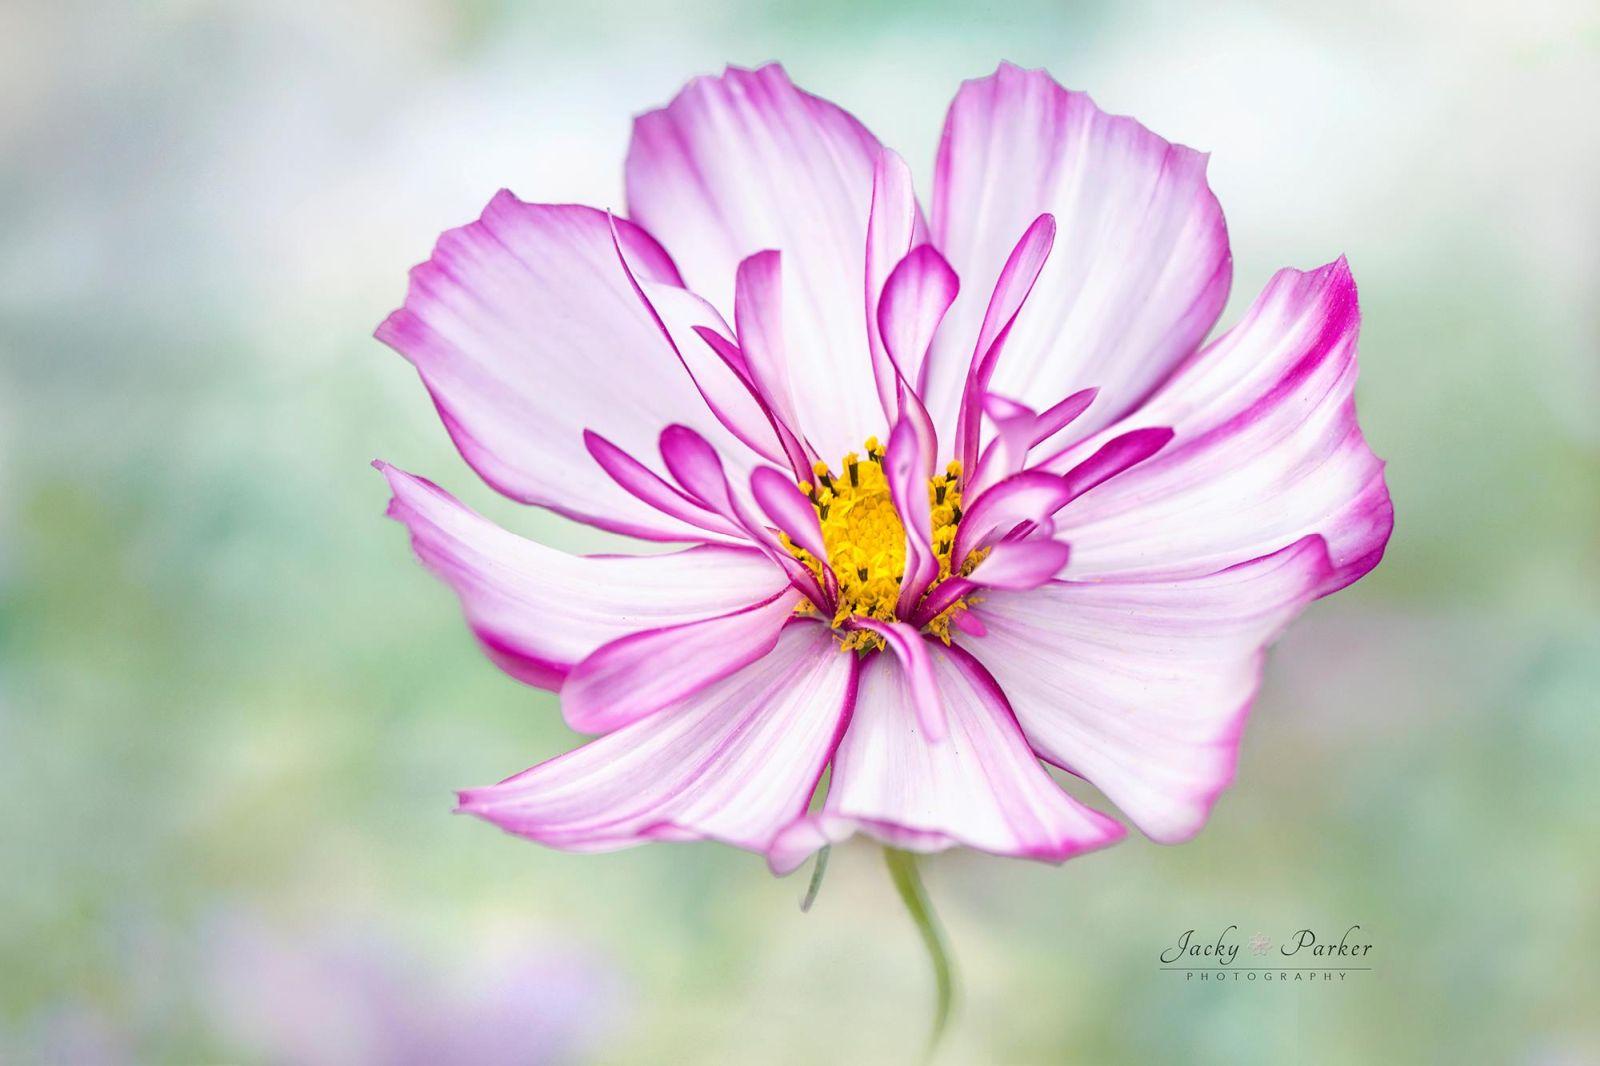 3 beautiful flower photography by jacky parker